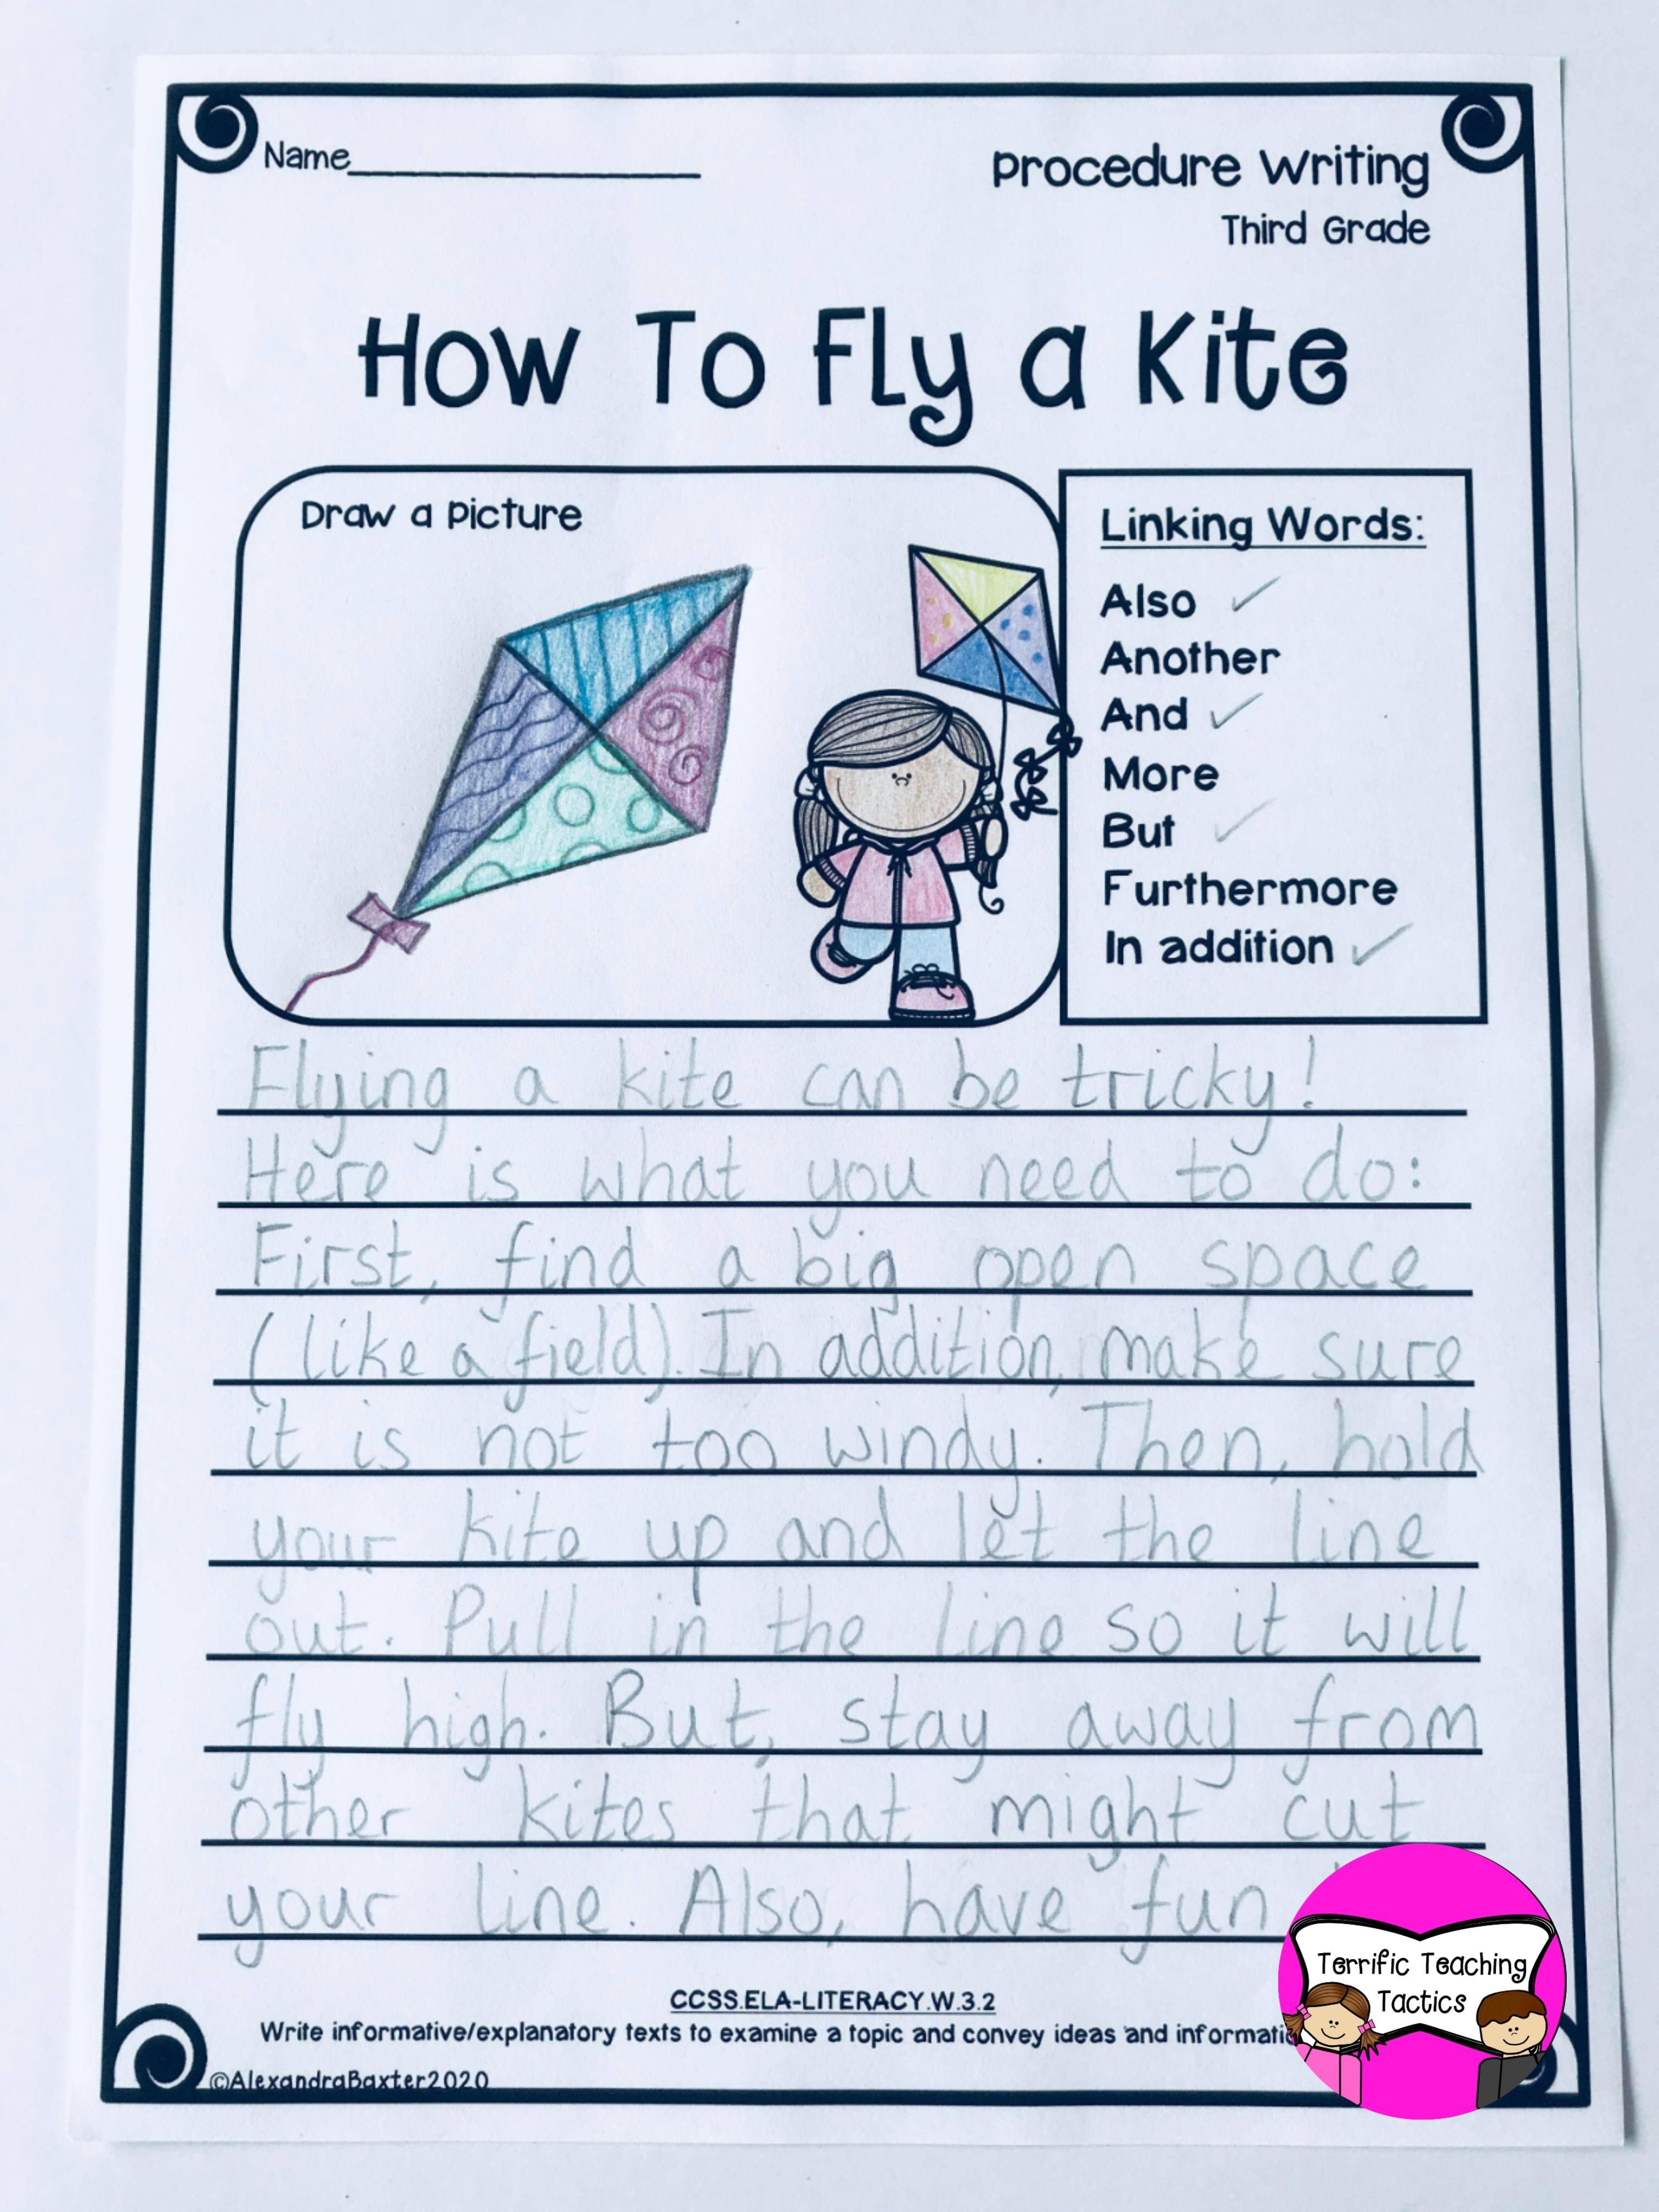 Third Grade Procedure Writing Prompts Worksheets In